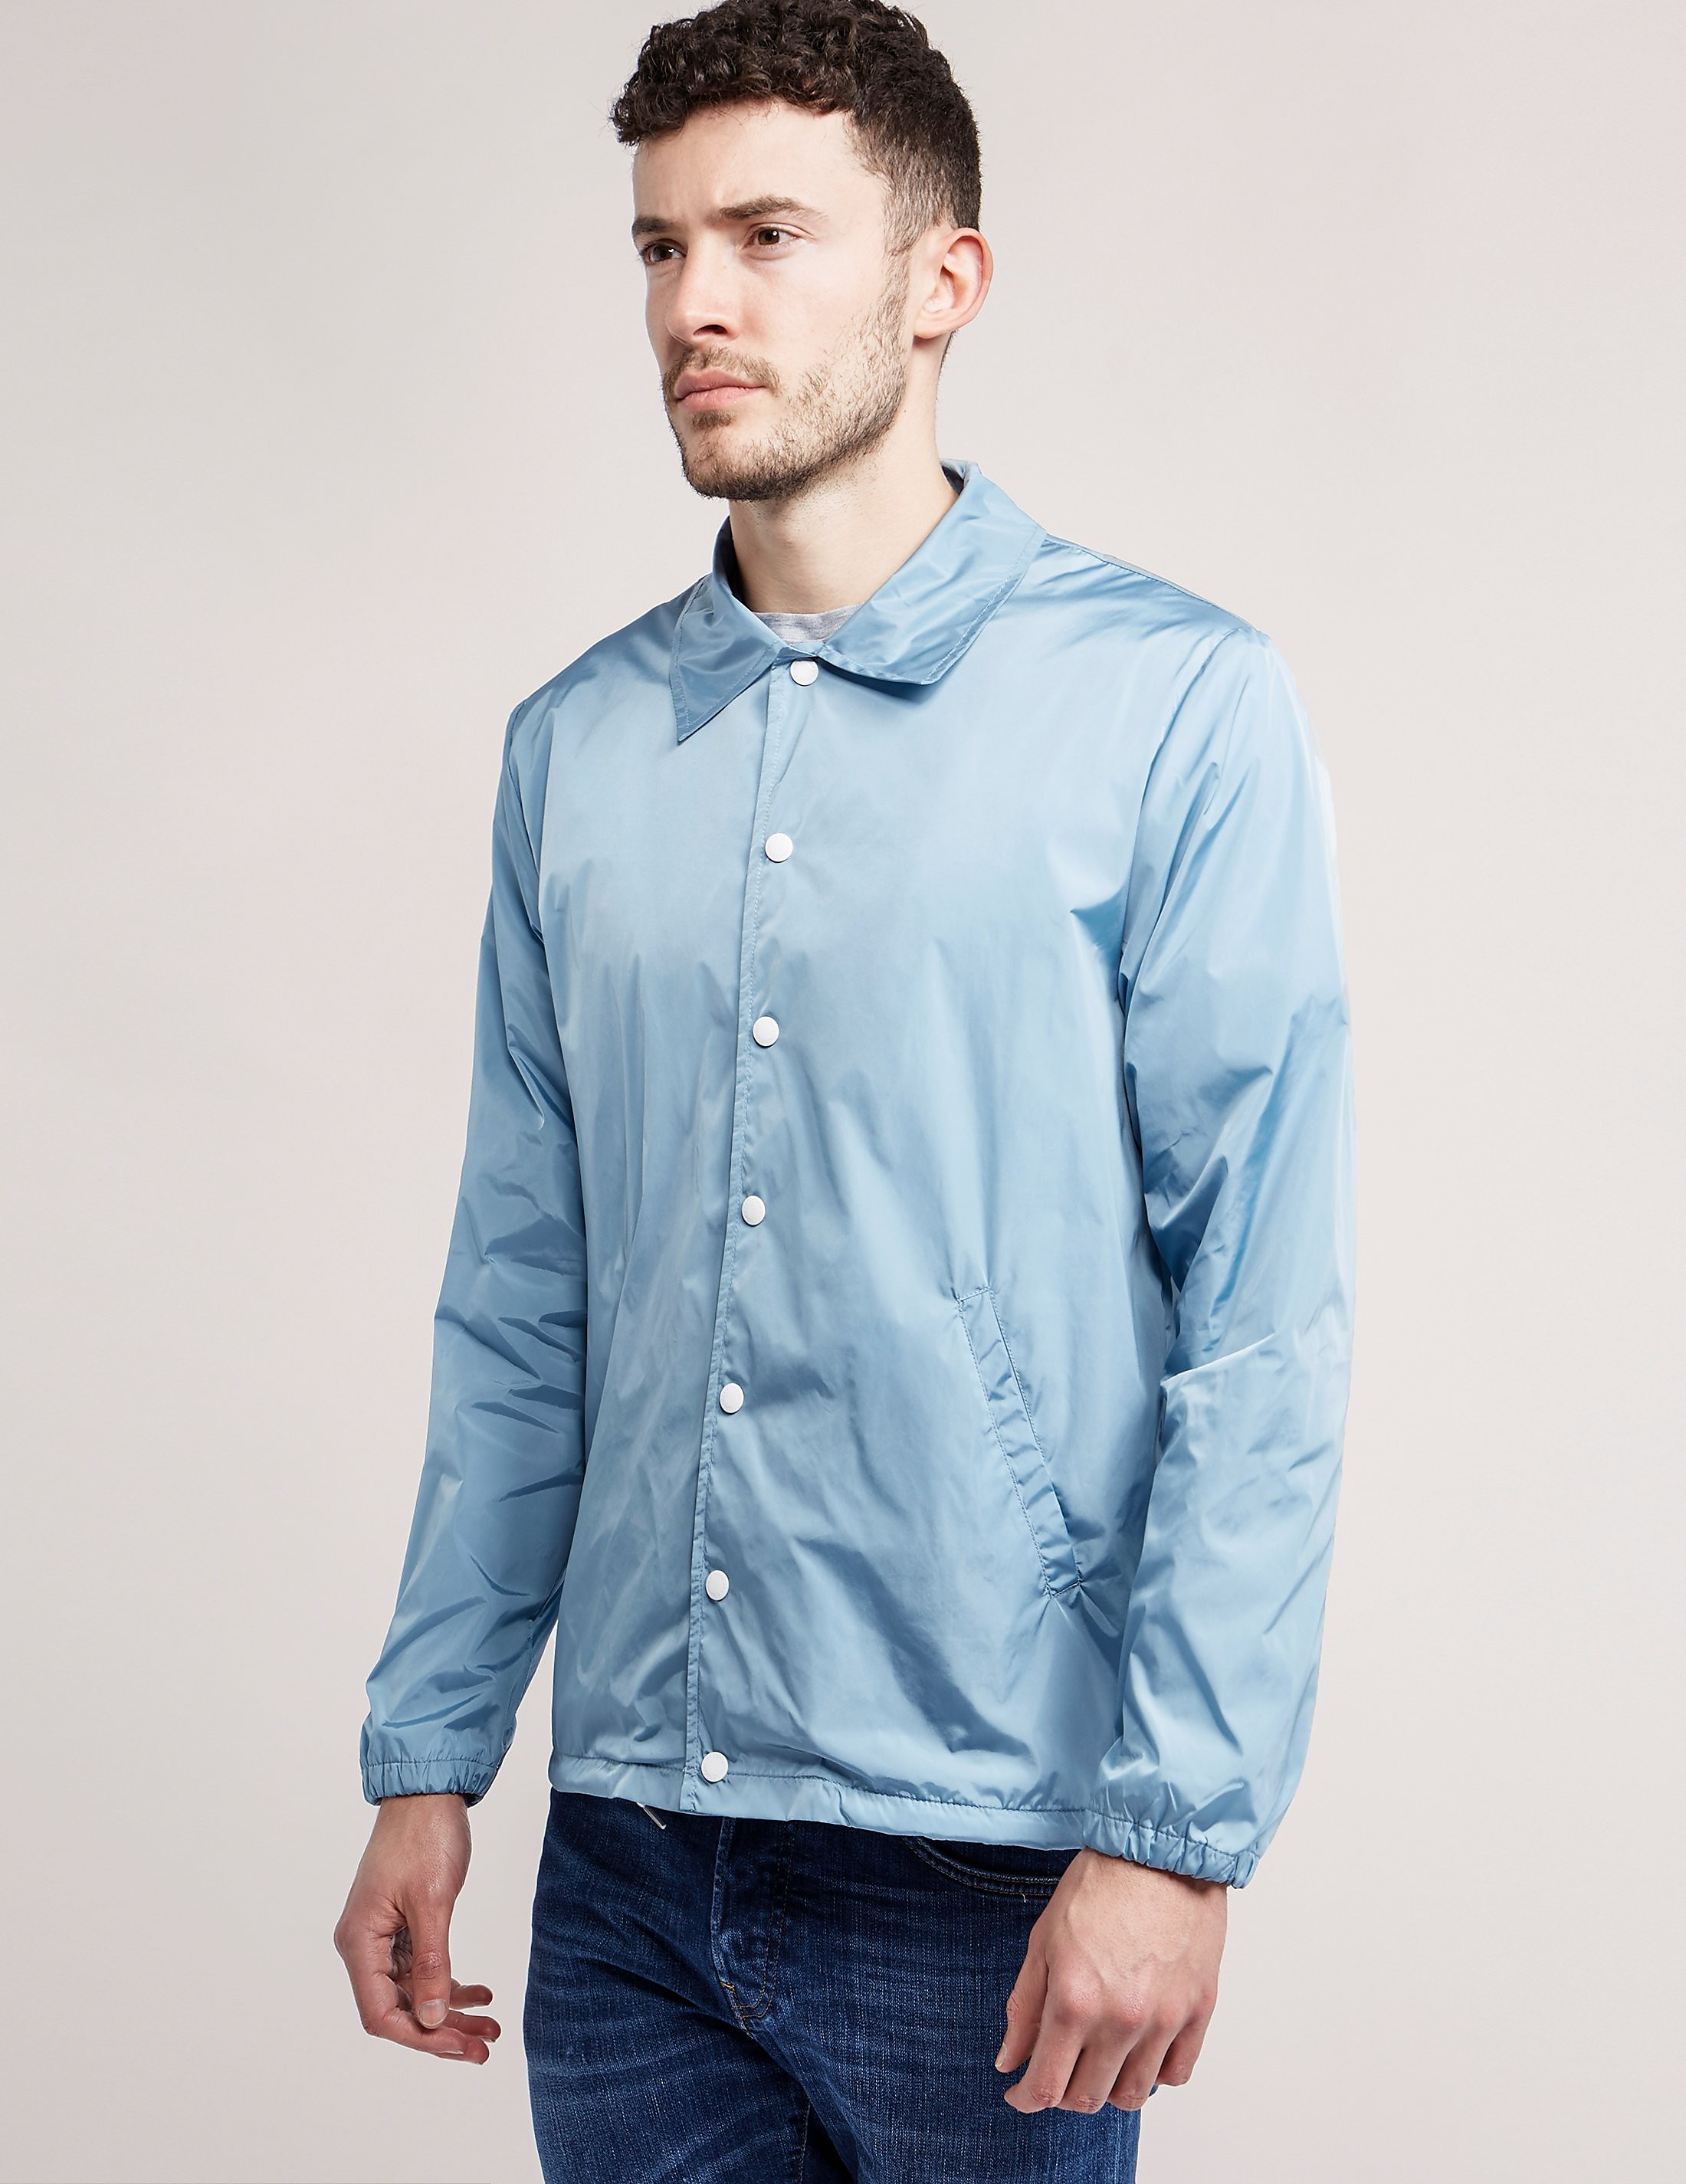 Maison Kitsune Light Windbreaker Jacket